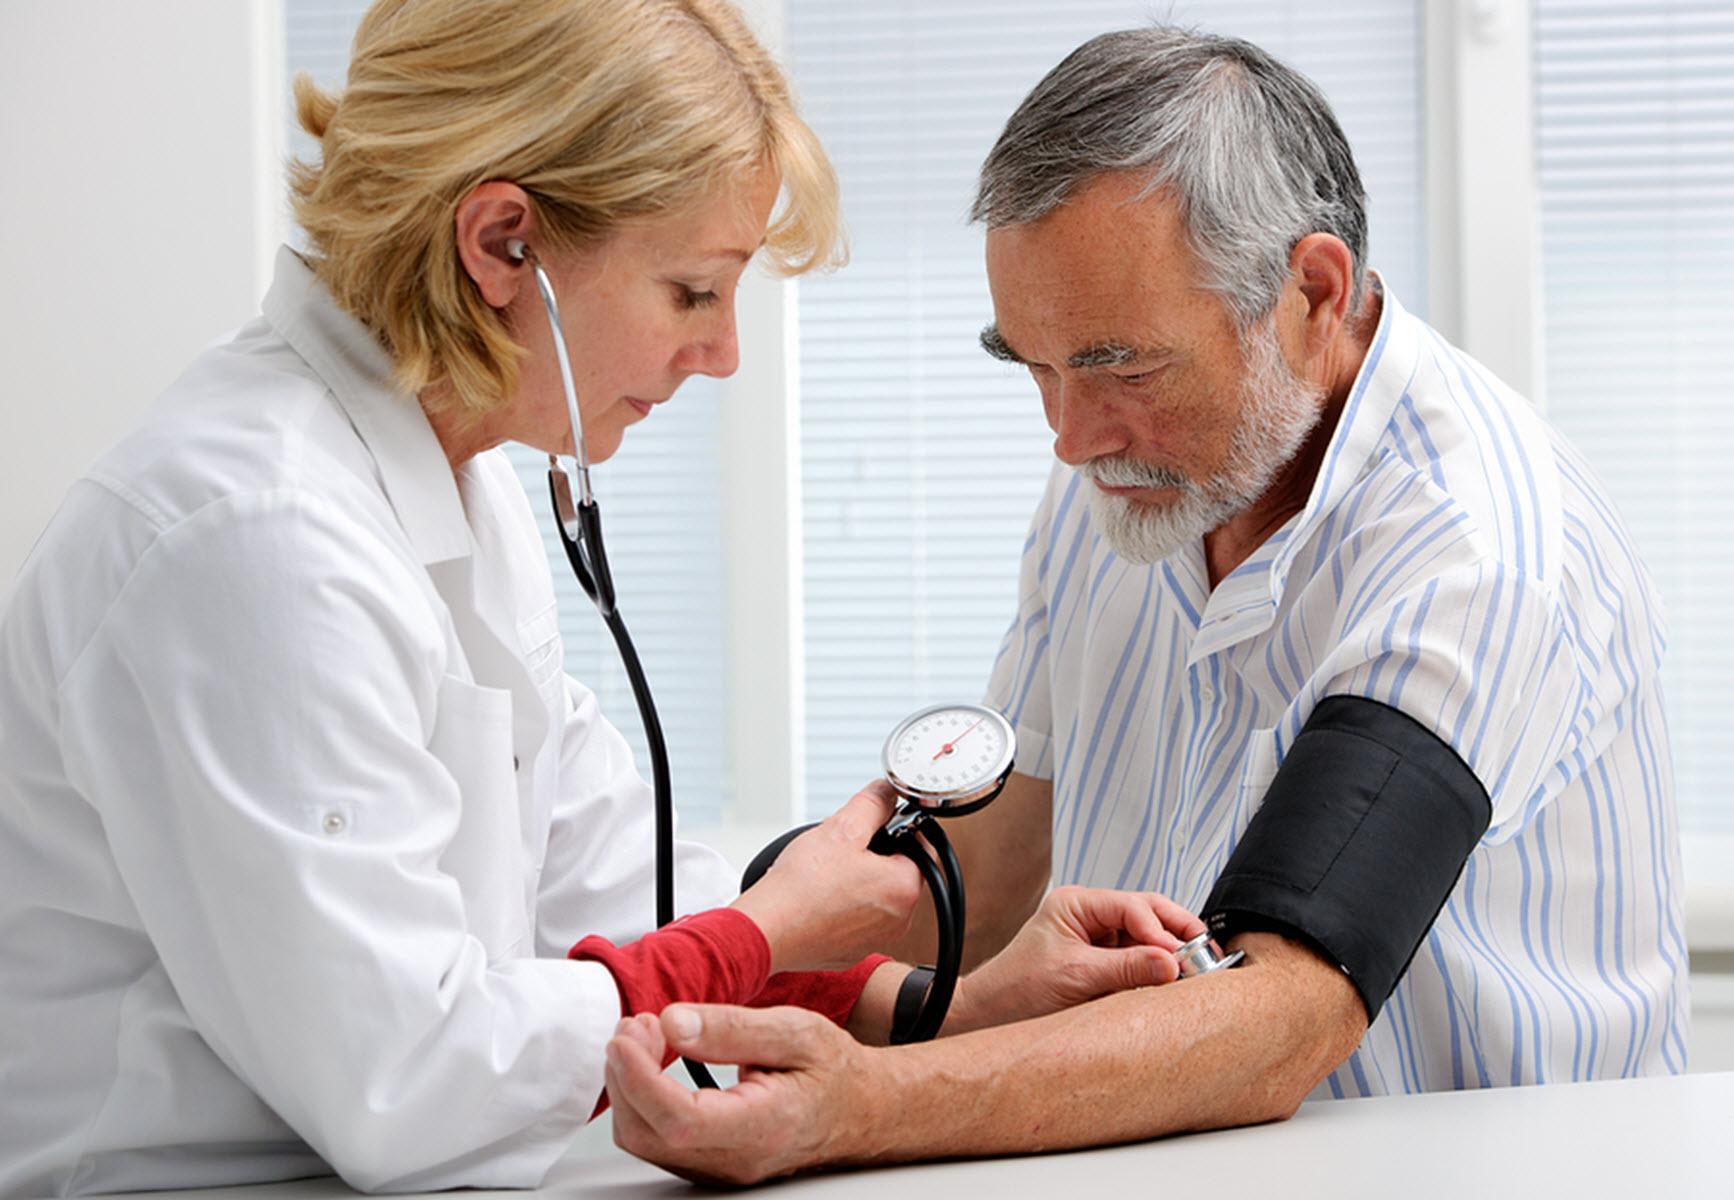 Home Care in Glendale AZ: High Blood Pressure and Covid-19